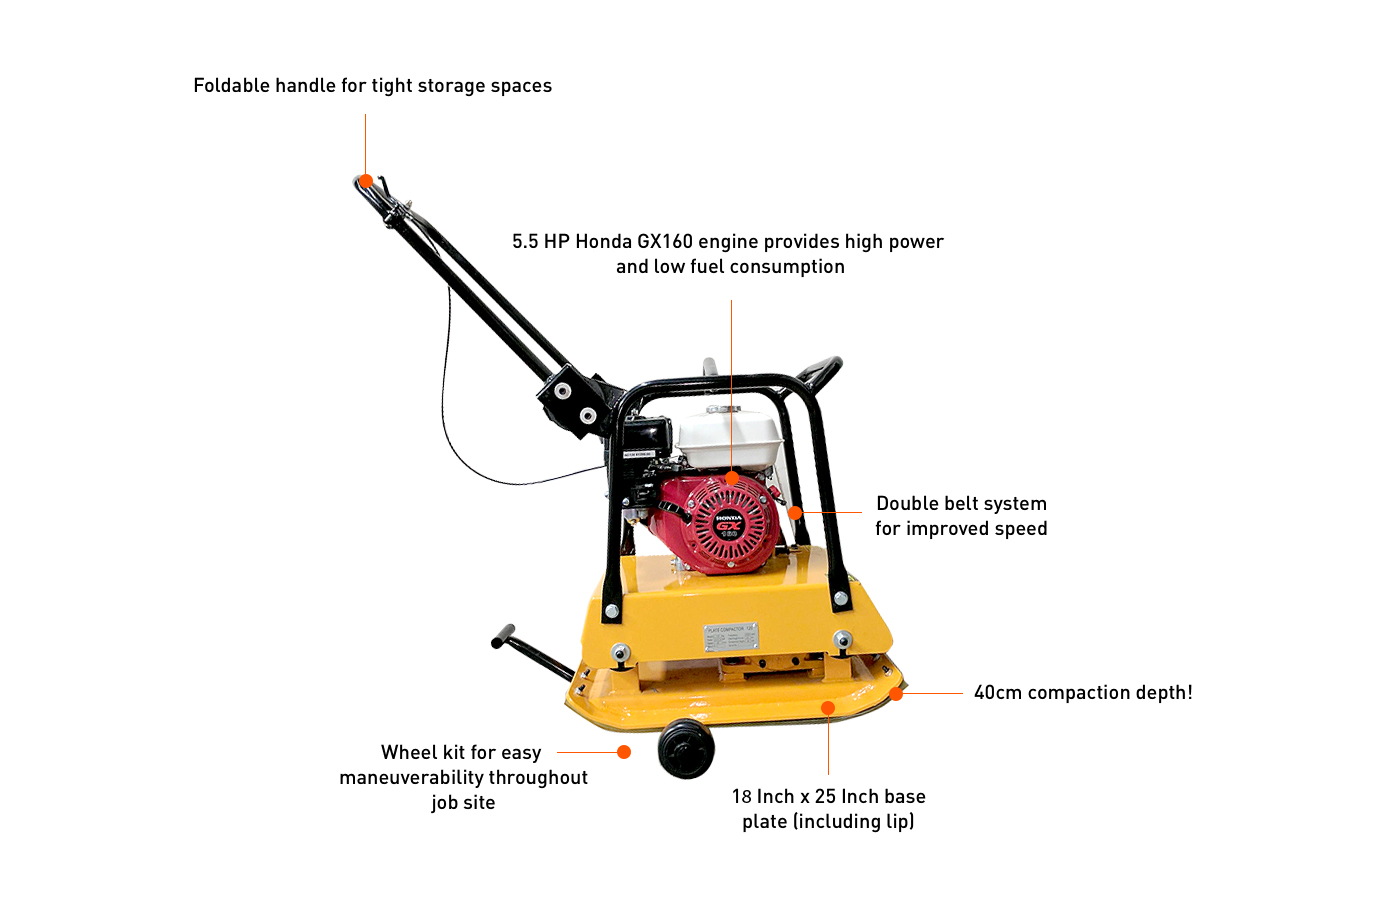 Commercial Compactor Wheel : Honda gx plate compactor tamper inch water wheel